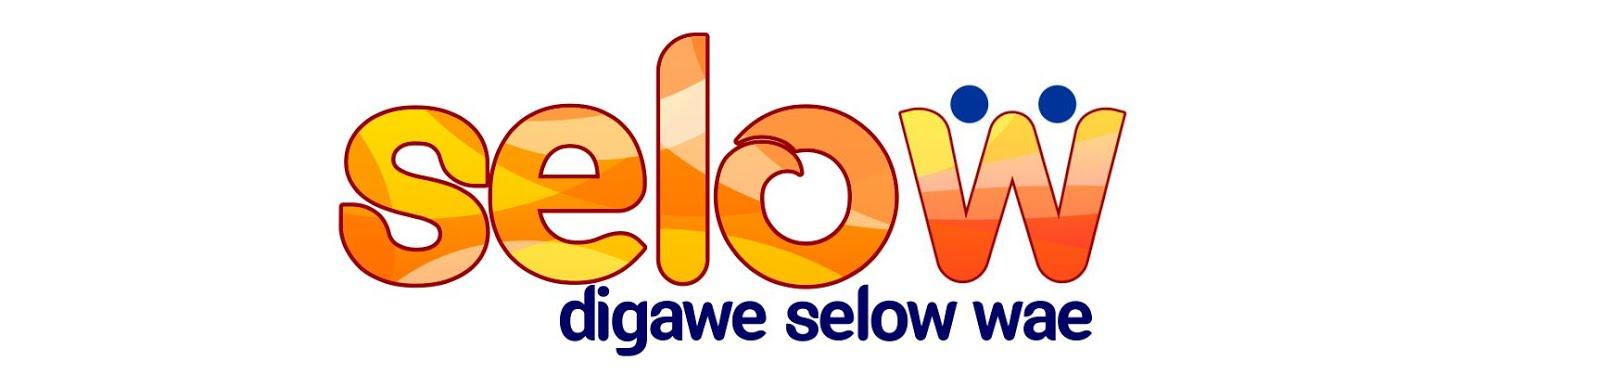 digawe Selow wae